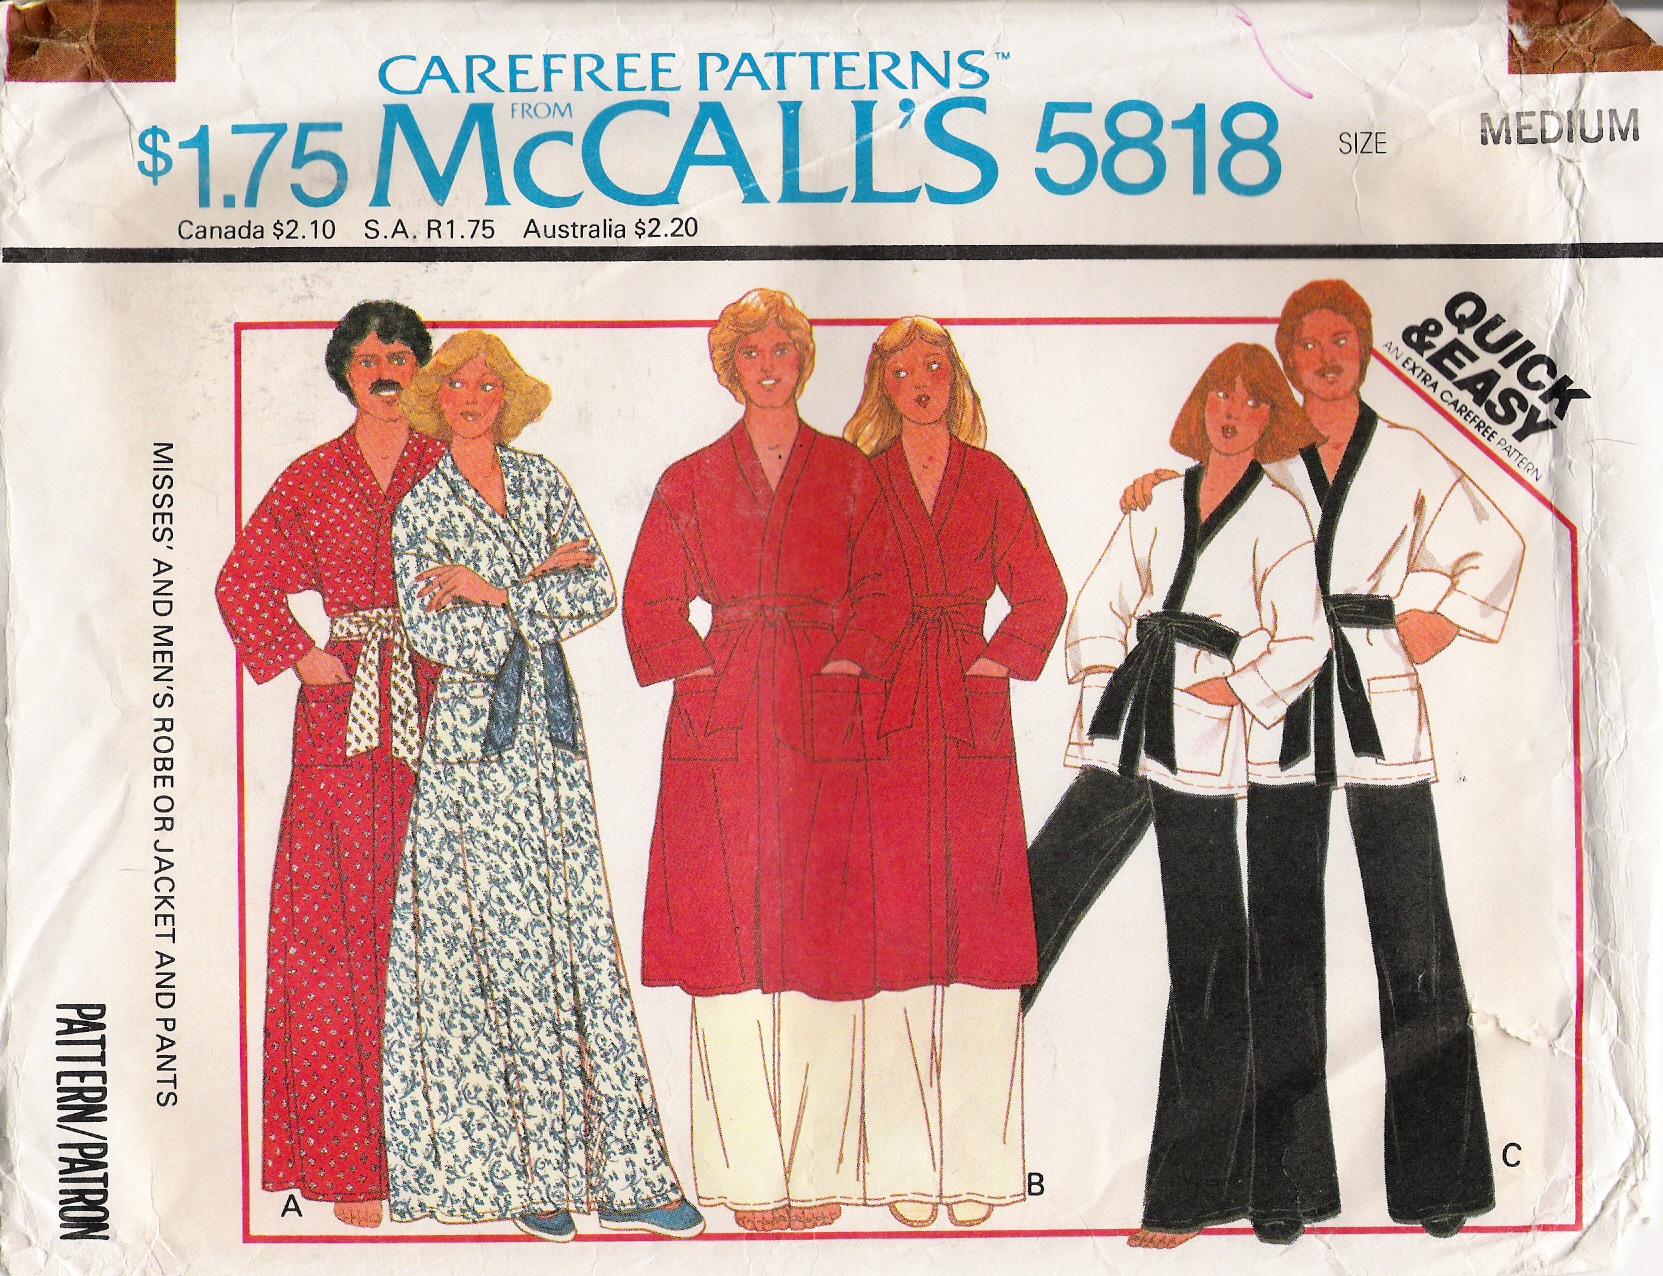 McCall's 5818